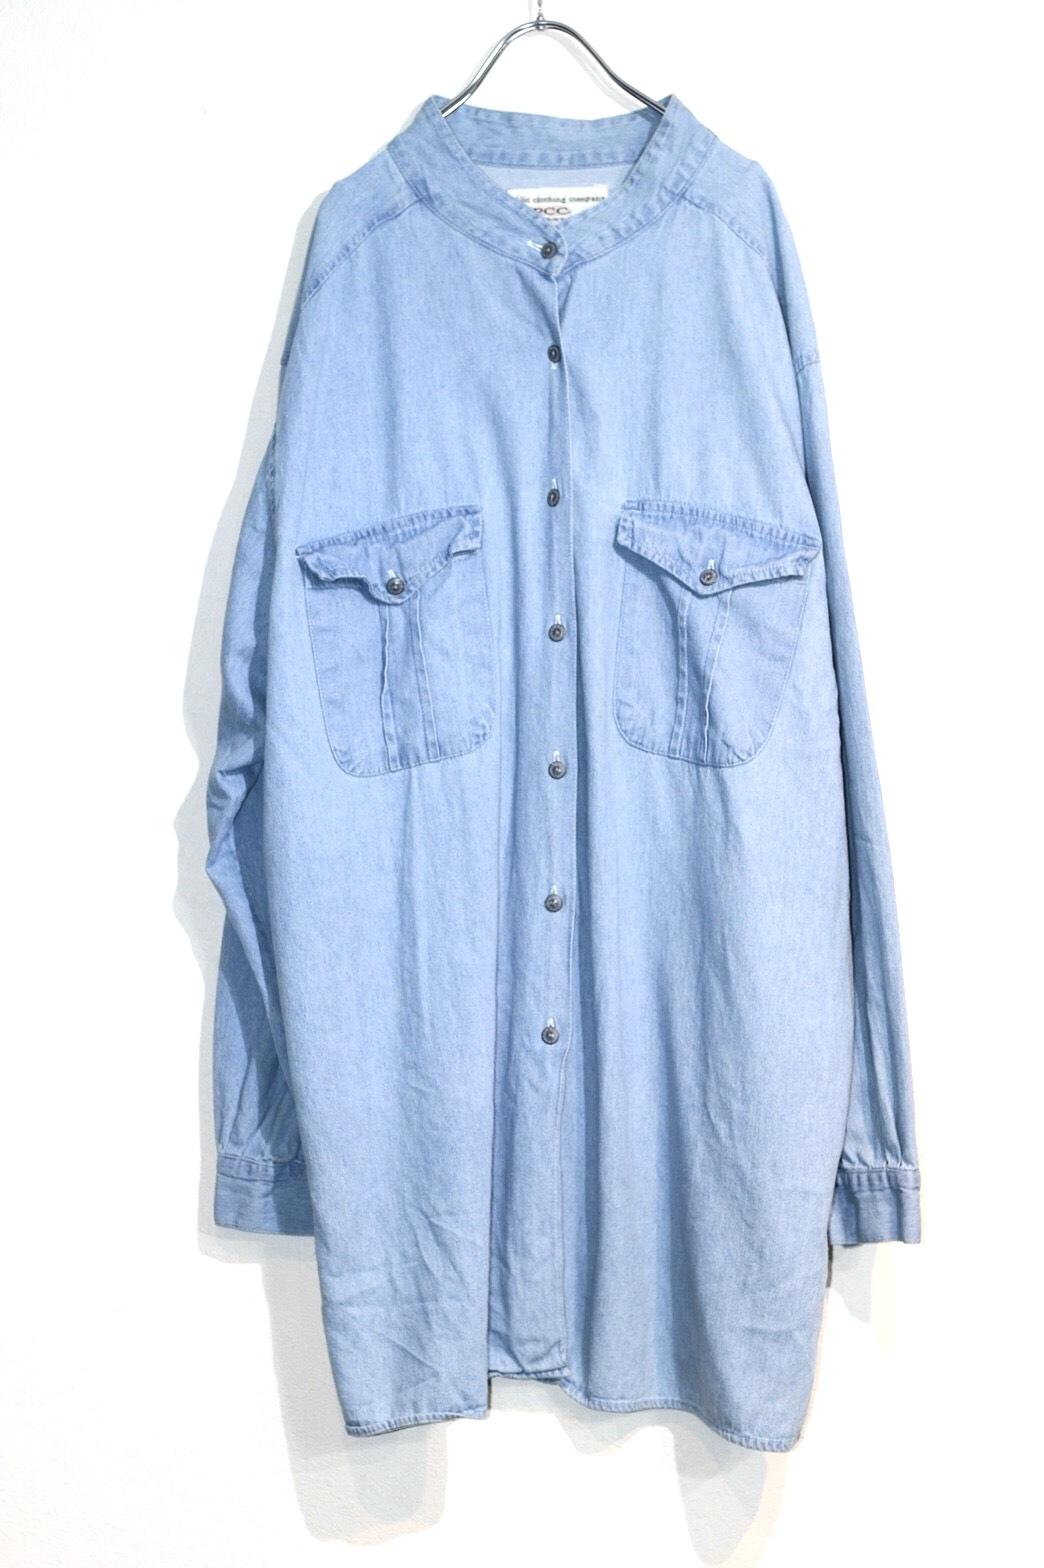 Design denim shirt